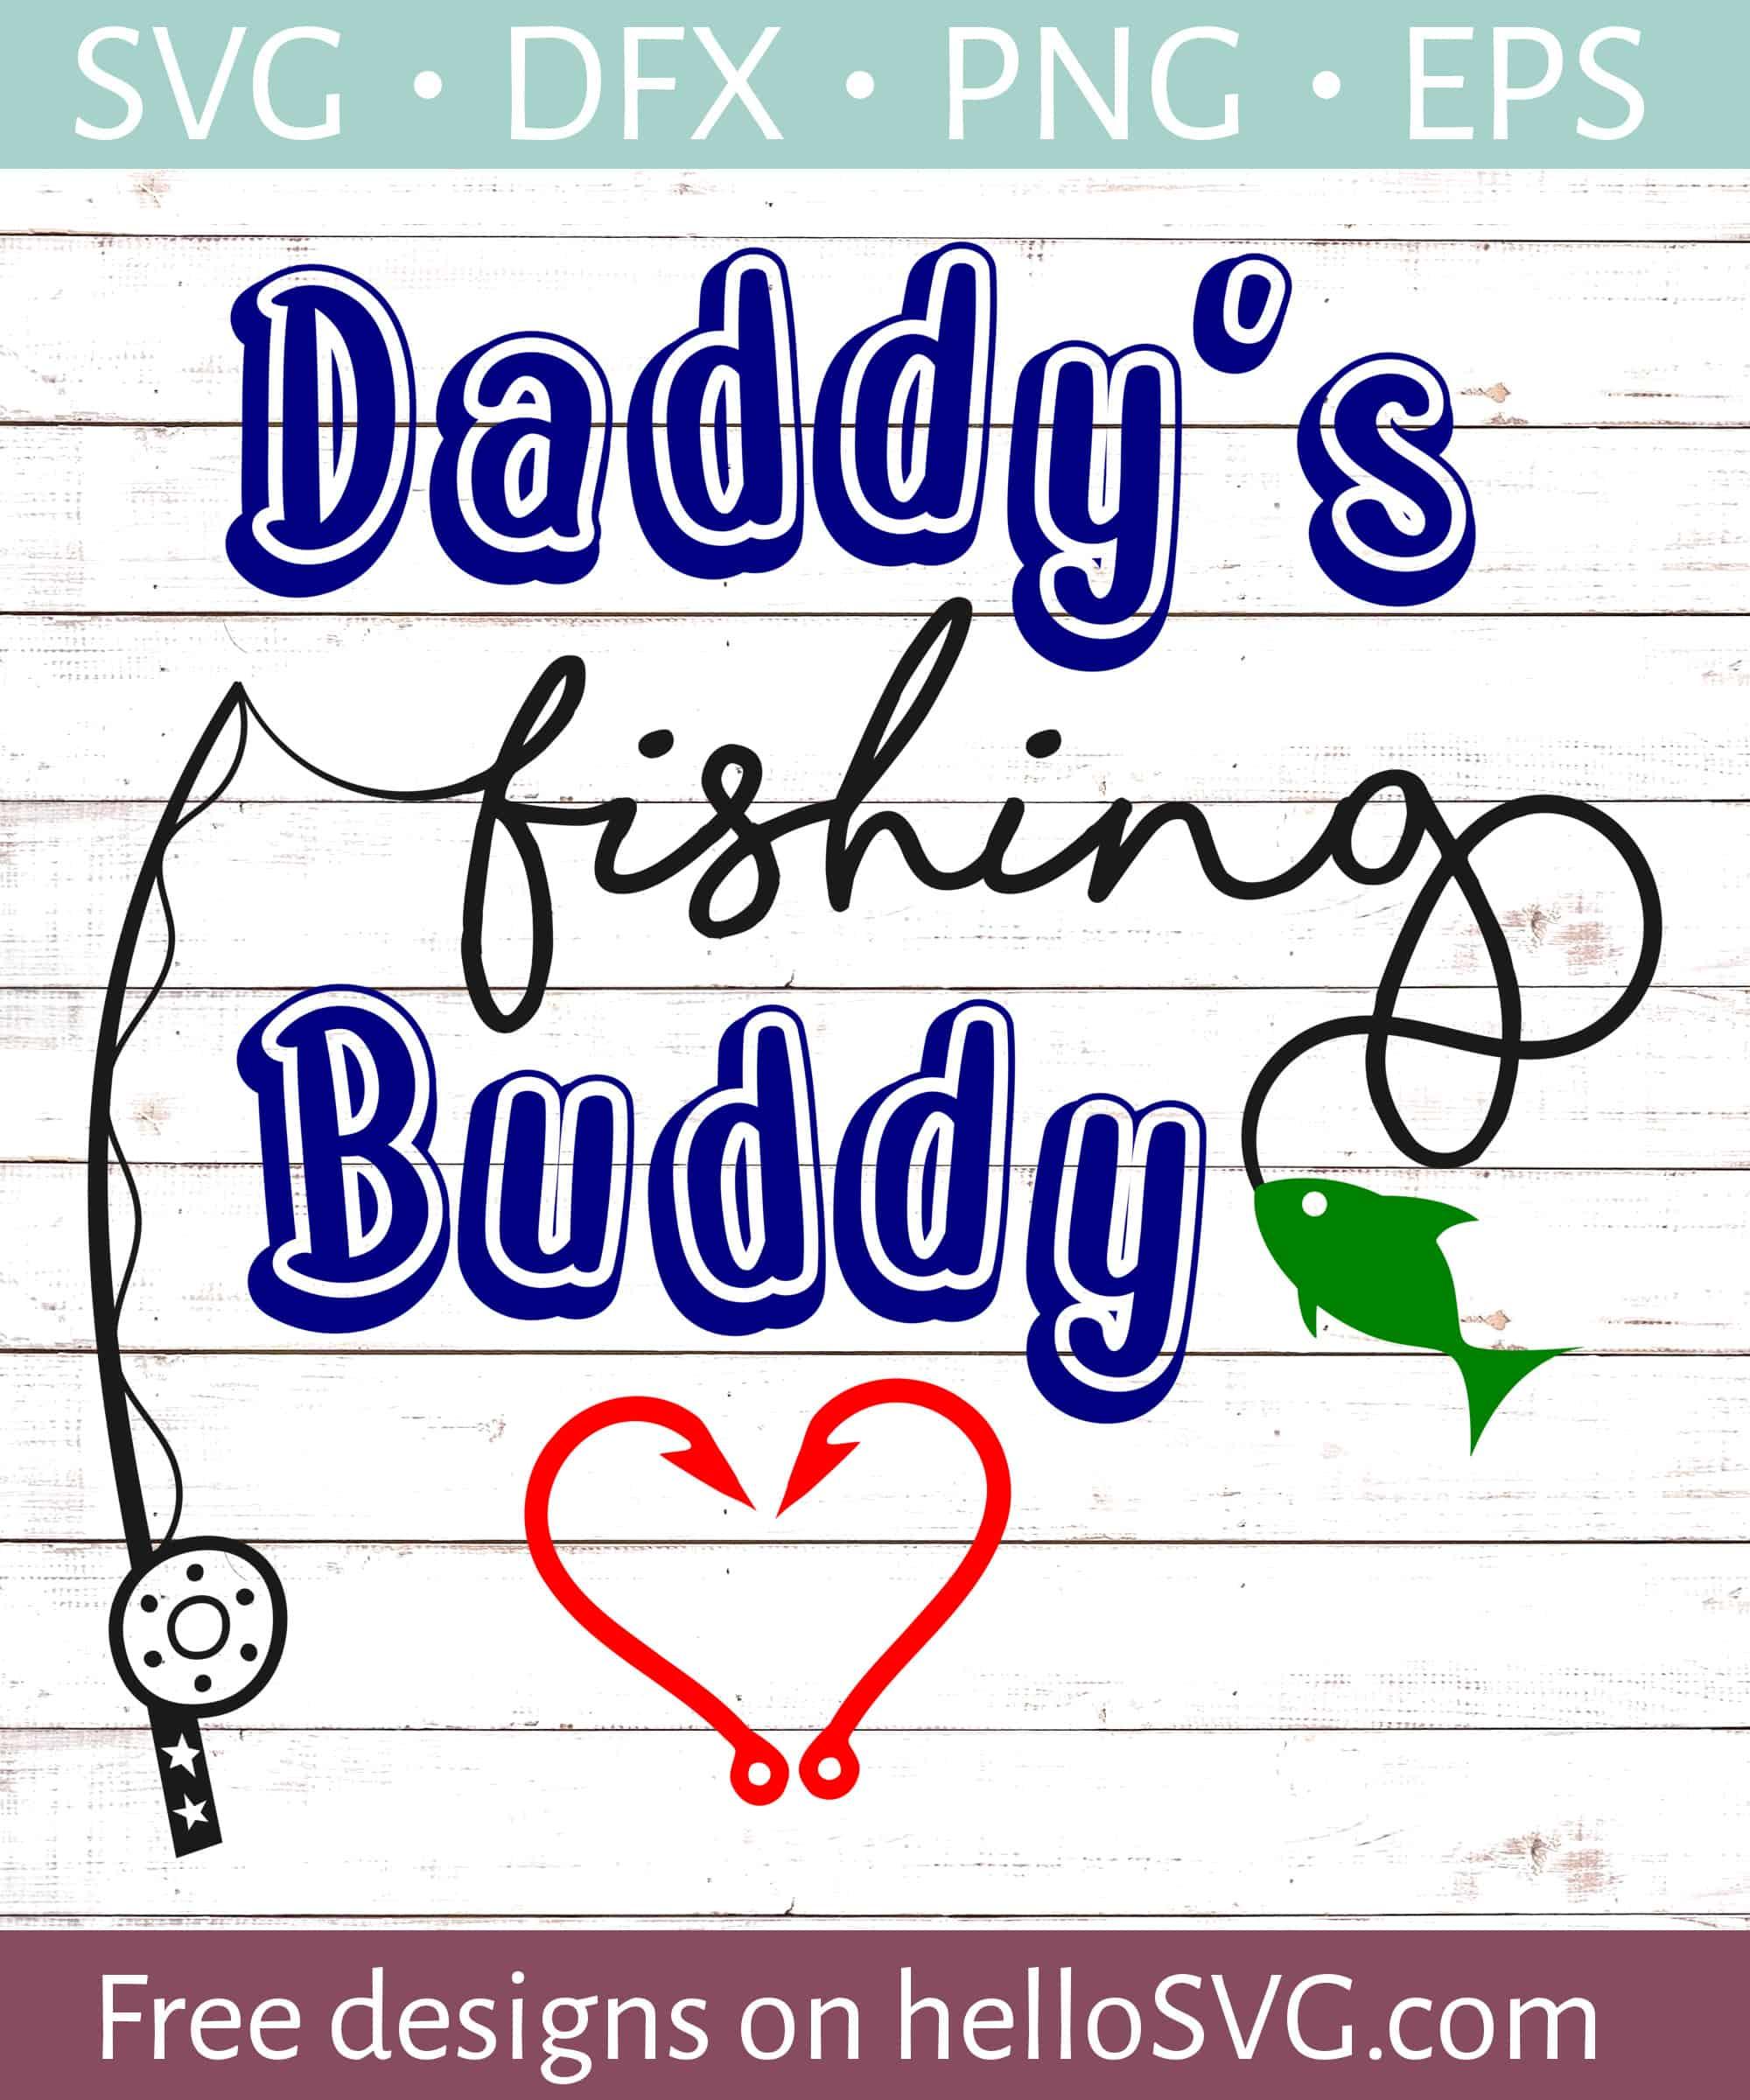 Download Daddy S Fishing Buddy 2 Svg Free Svg Files Hellosvg Com